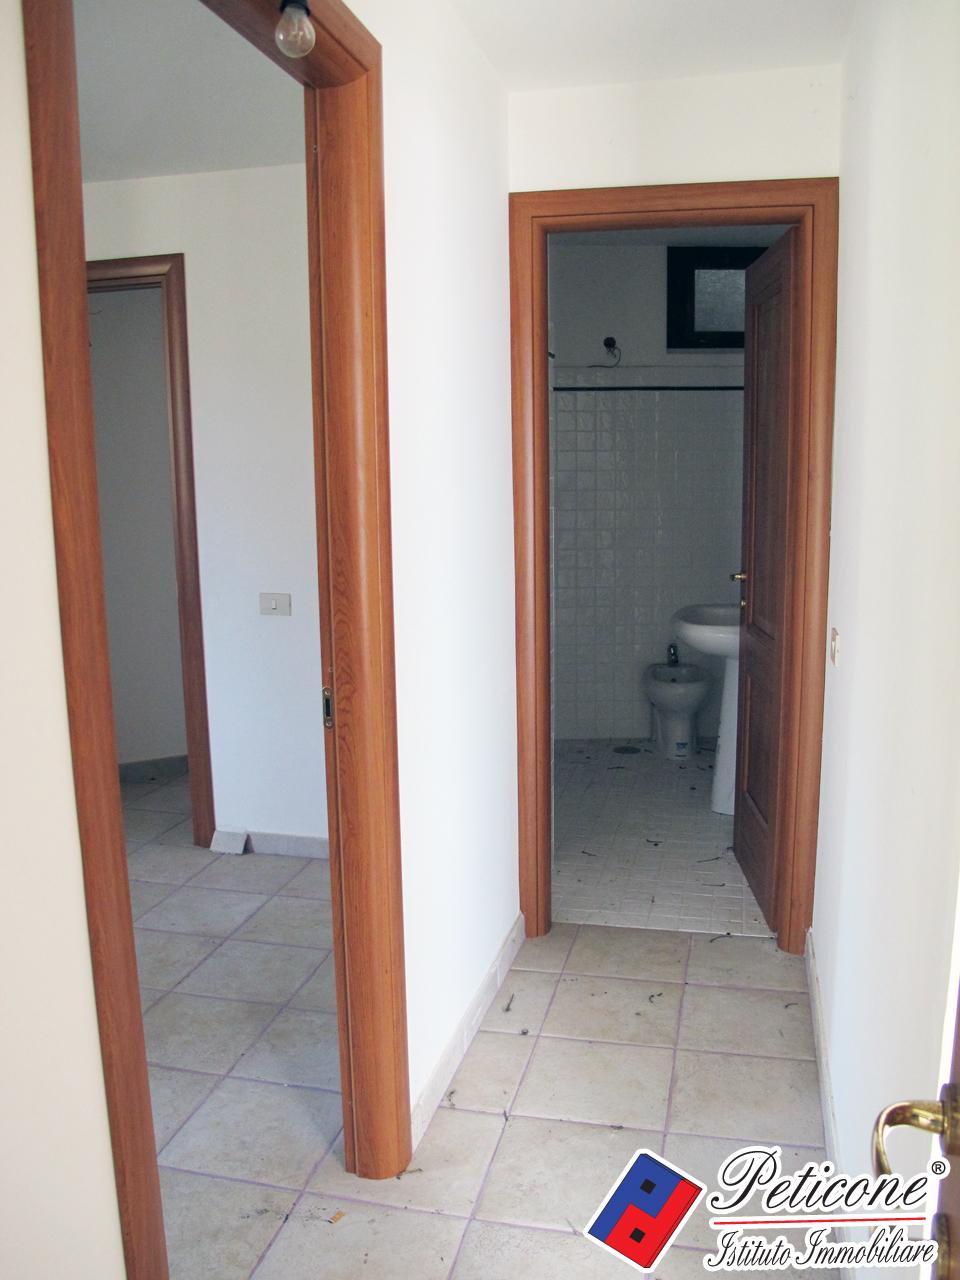 Appartamento in Vendita a Sperlonga: 1 locali, 45 mq - Foto 9